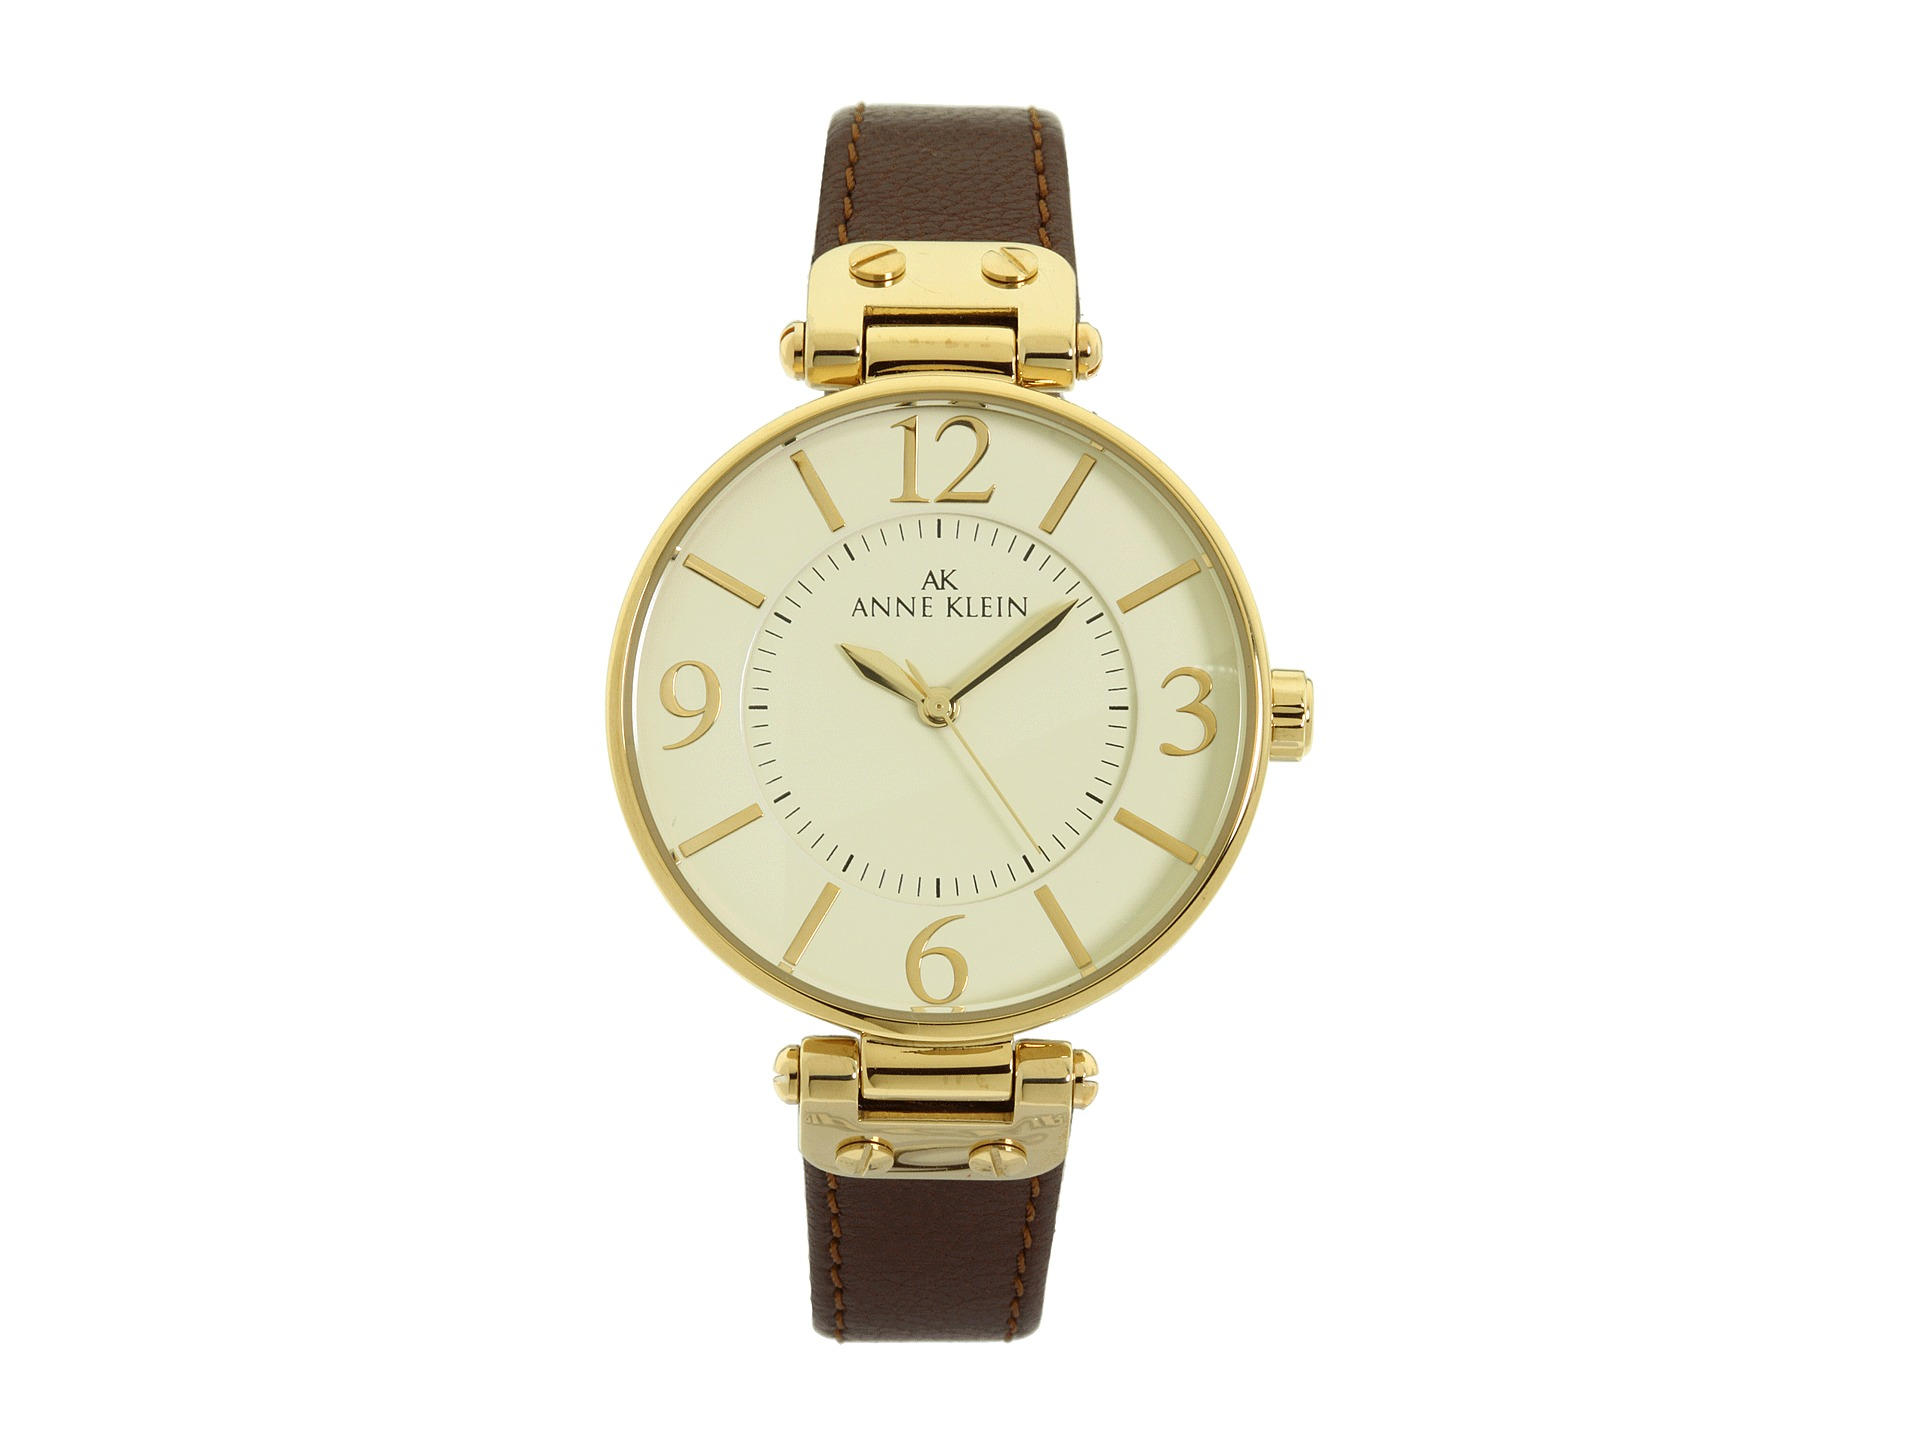 Anne klein 109168ivbn round dial leather strap watch free shipping both ways for Anne klein leather strap